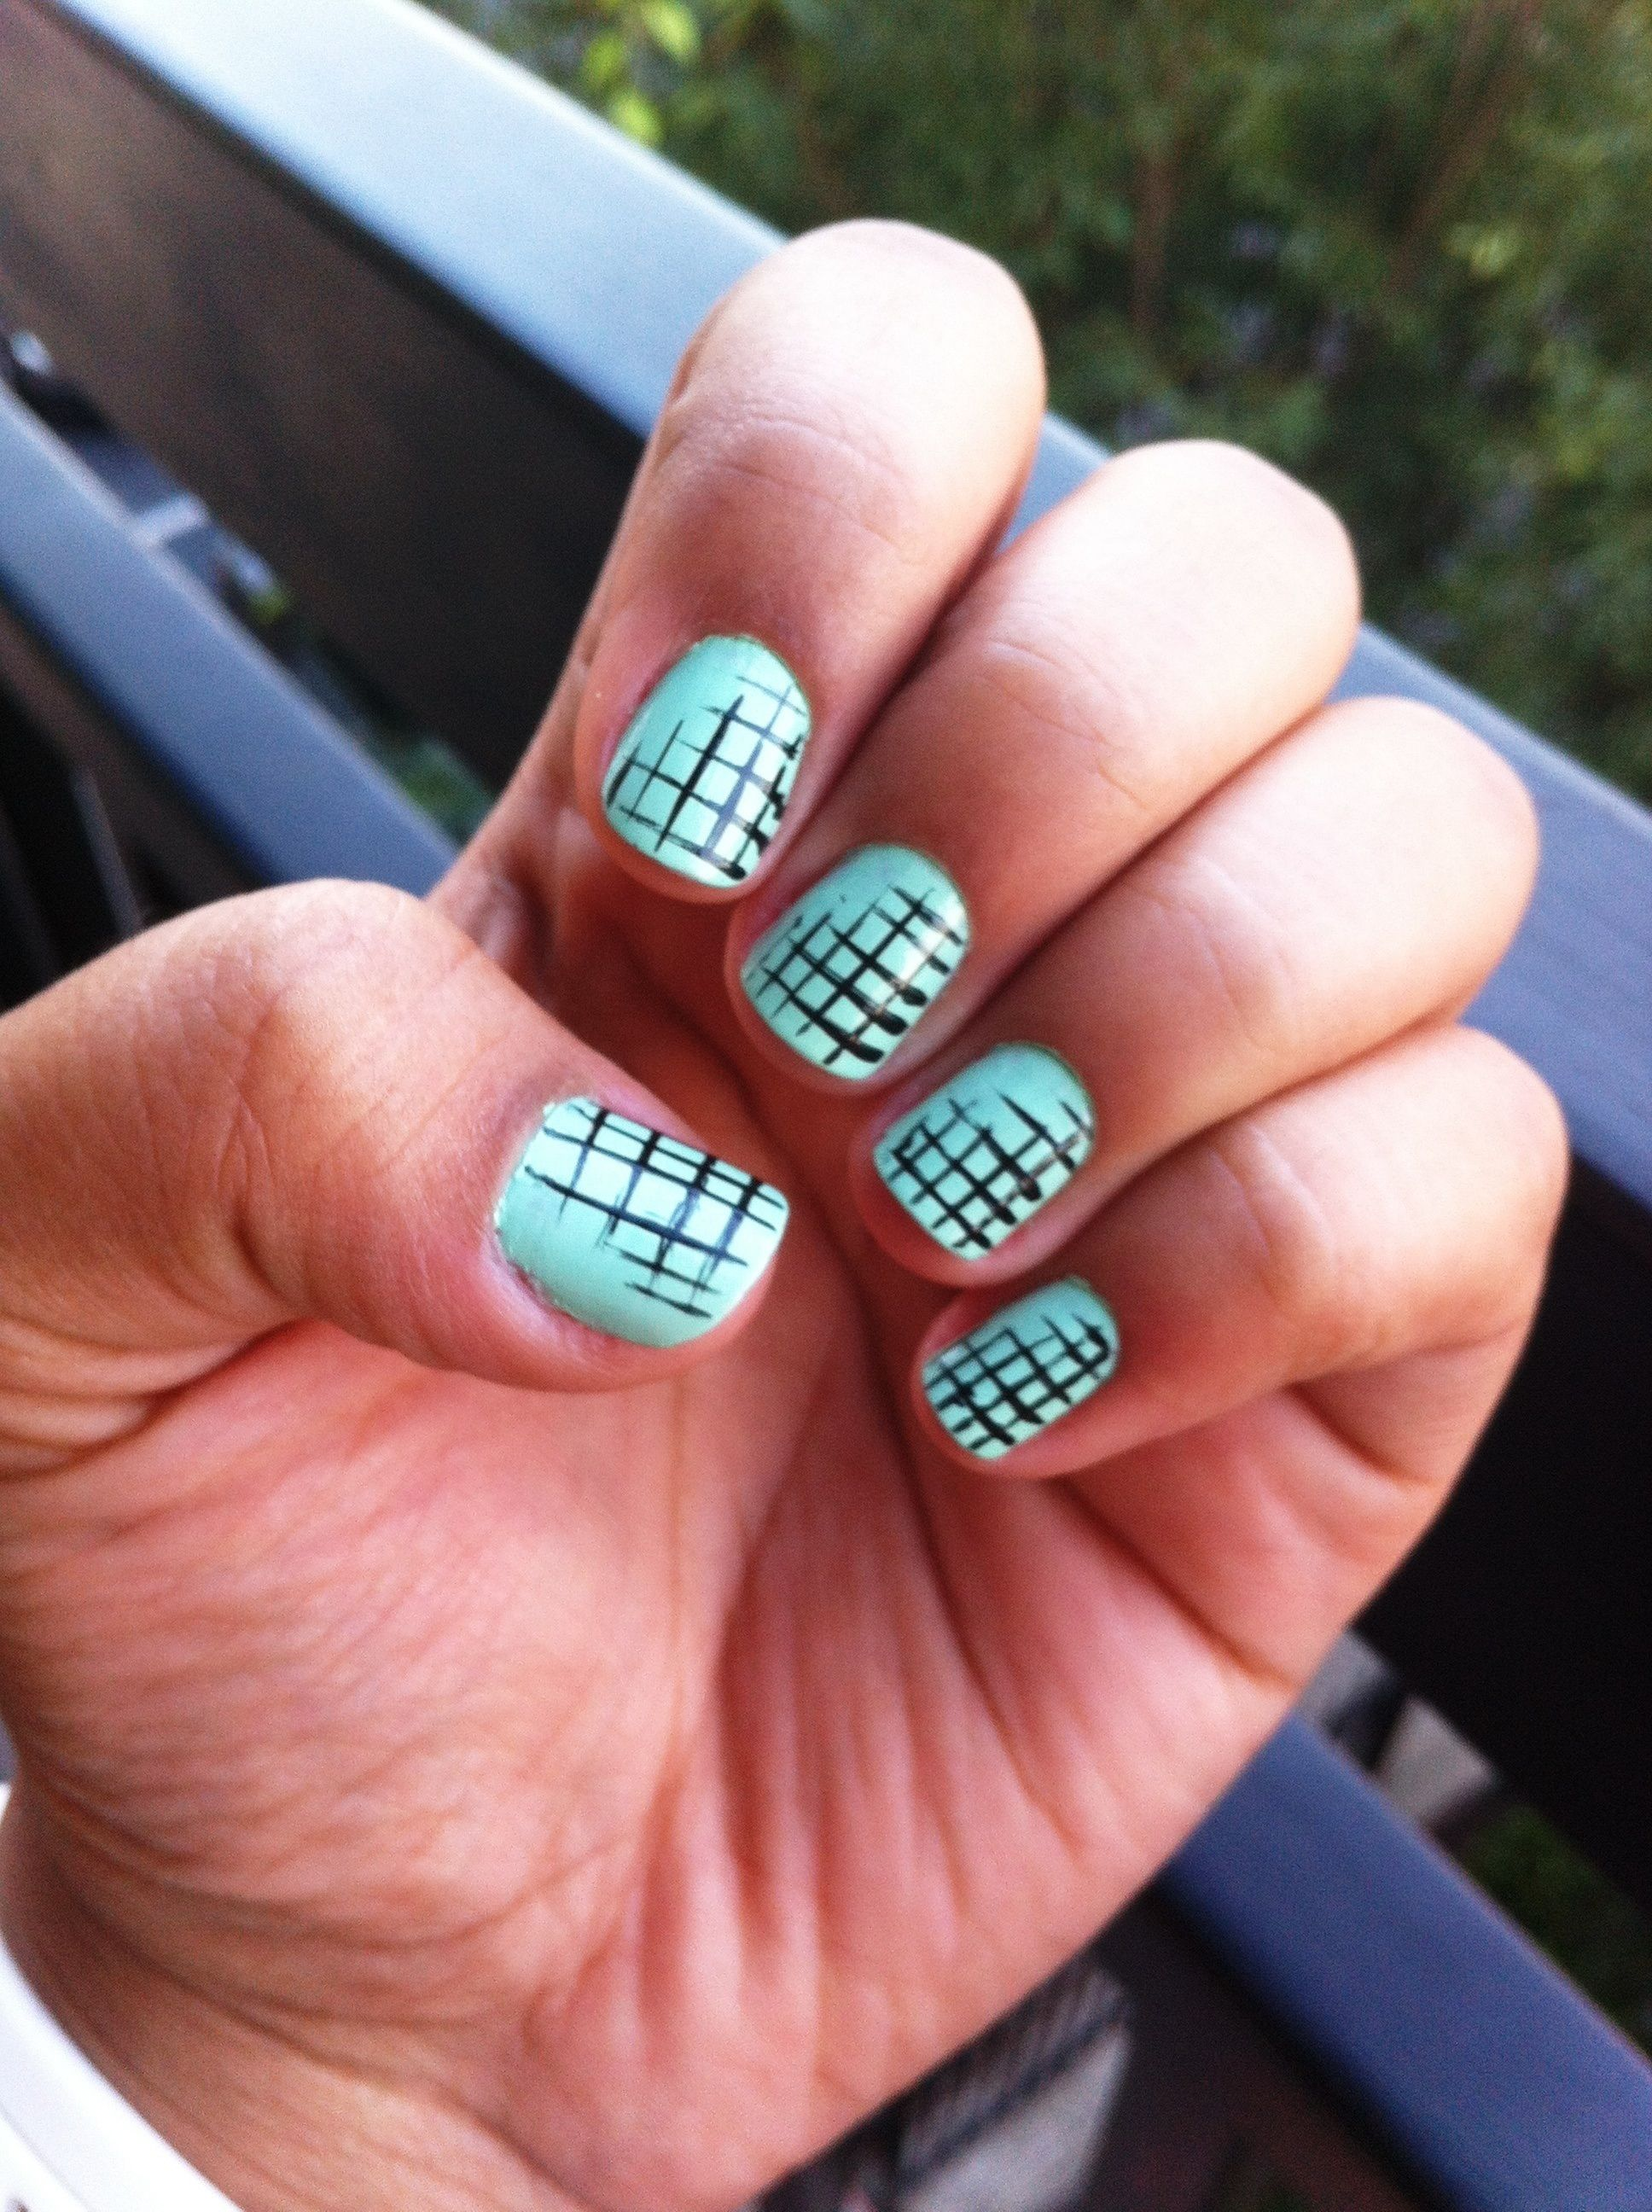 Easy criss-crossed stripes pattern